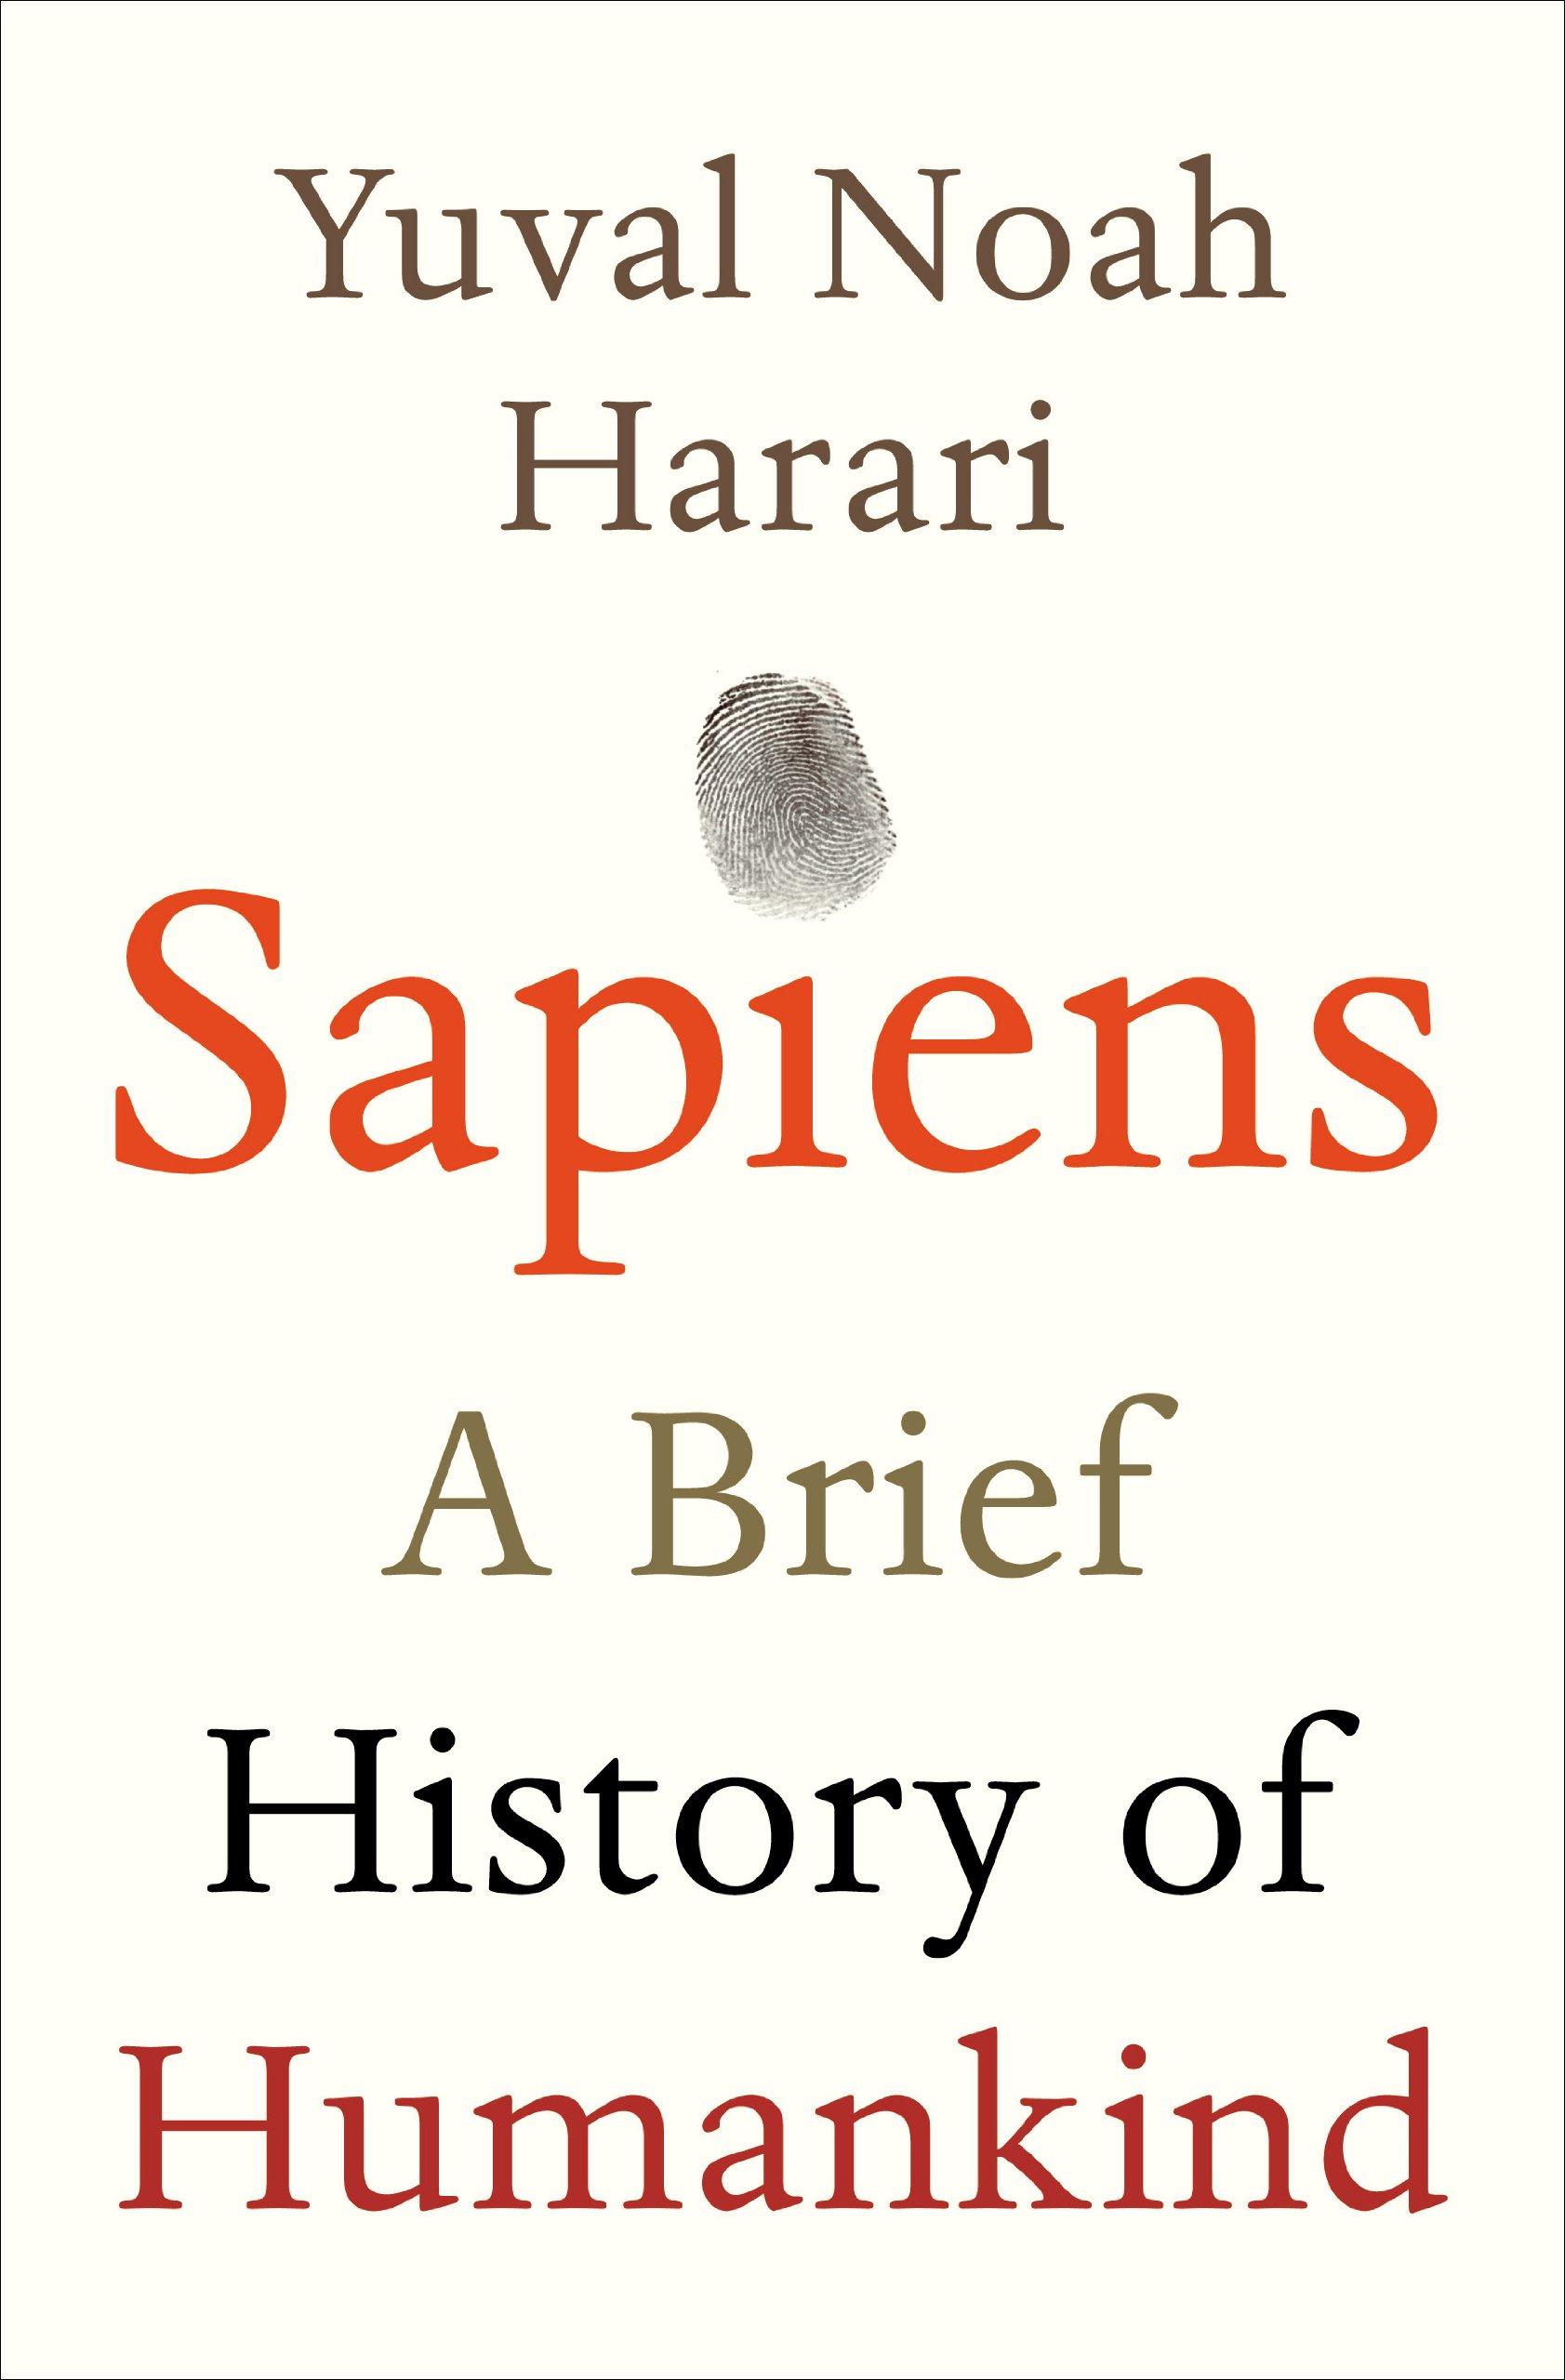 sapiens-book-cover-yuval-noah-harari